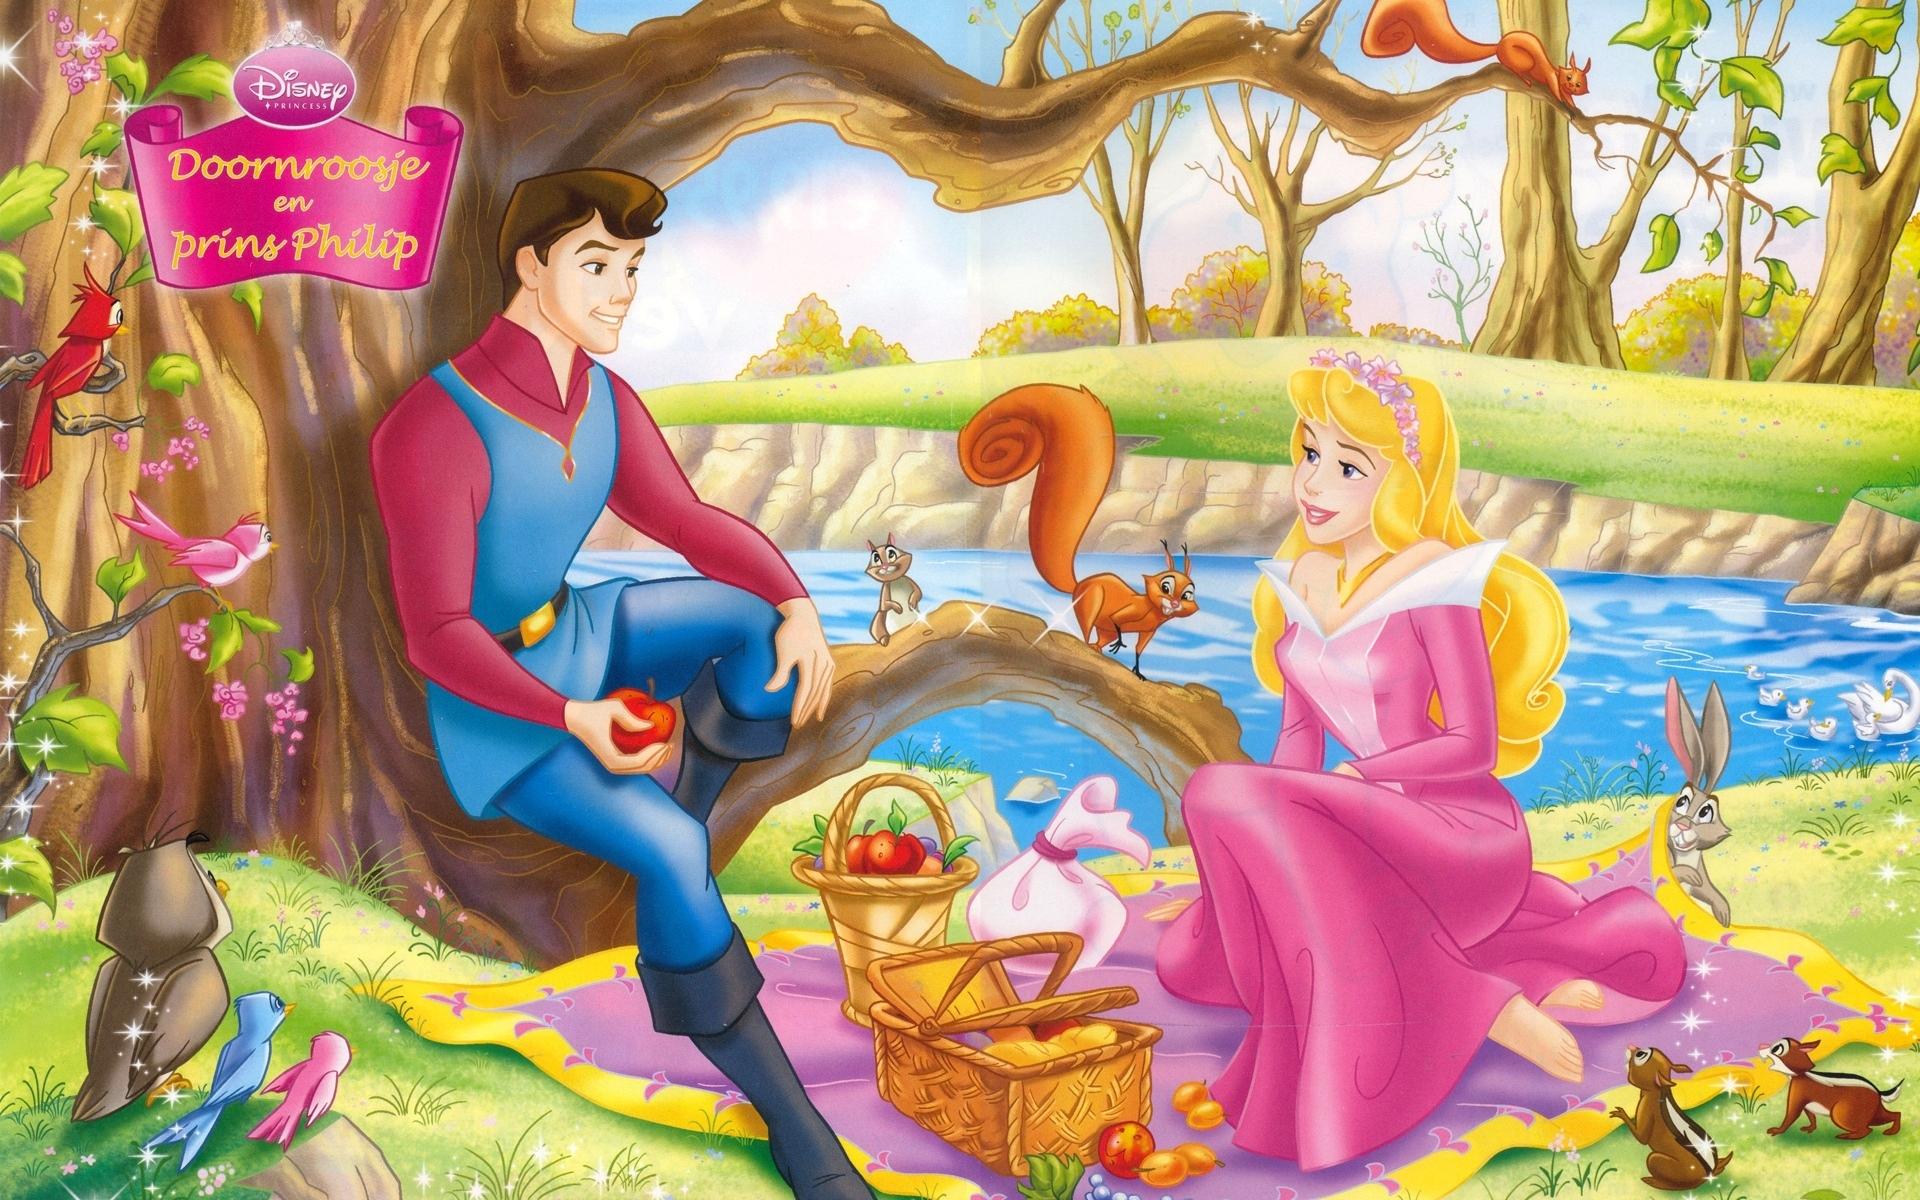 أميرات ديزنى رائعة Princess-Aurora-disney-princess-7359183-1920-1200